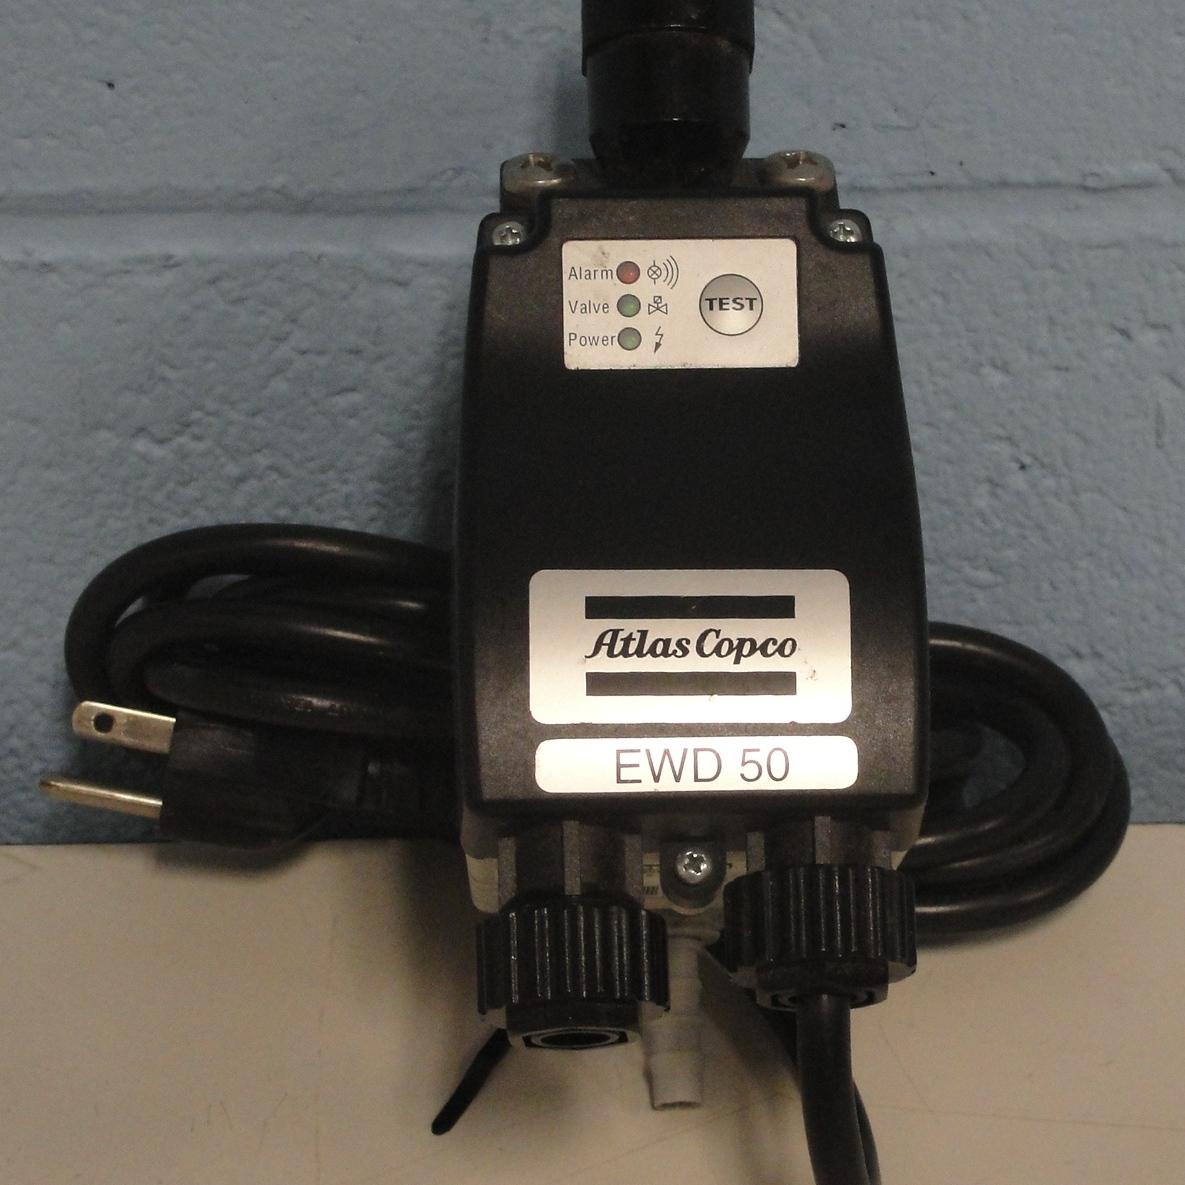 Atlas Copco EWD 50 Automatic Electronic Drain Valve Image